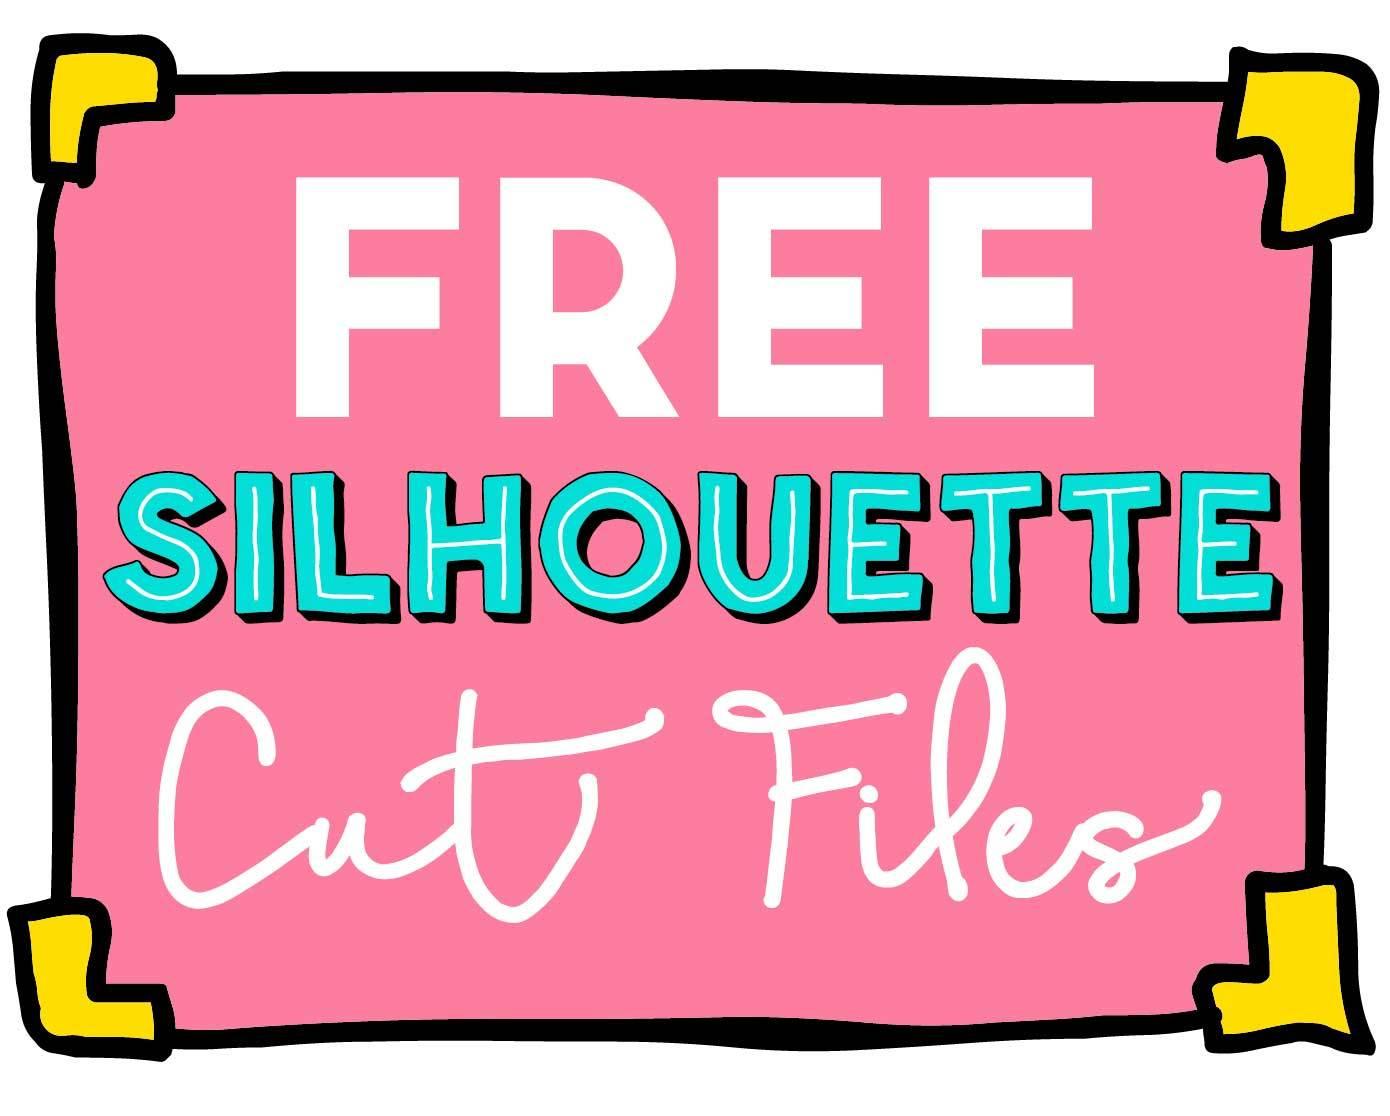 1390x1116 Free Silhouette Cut Files!